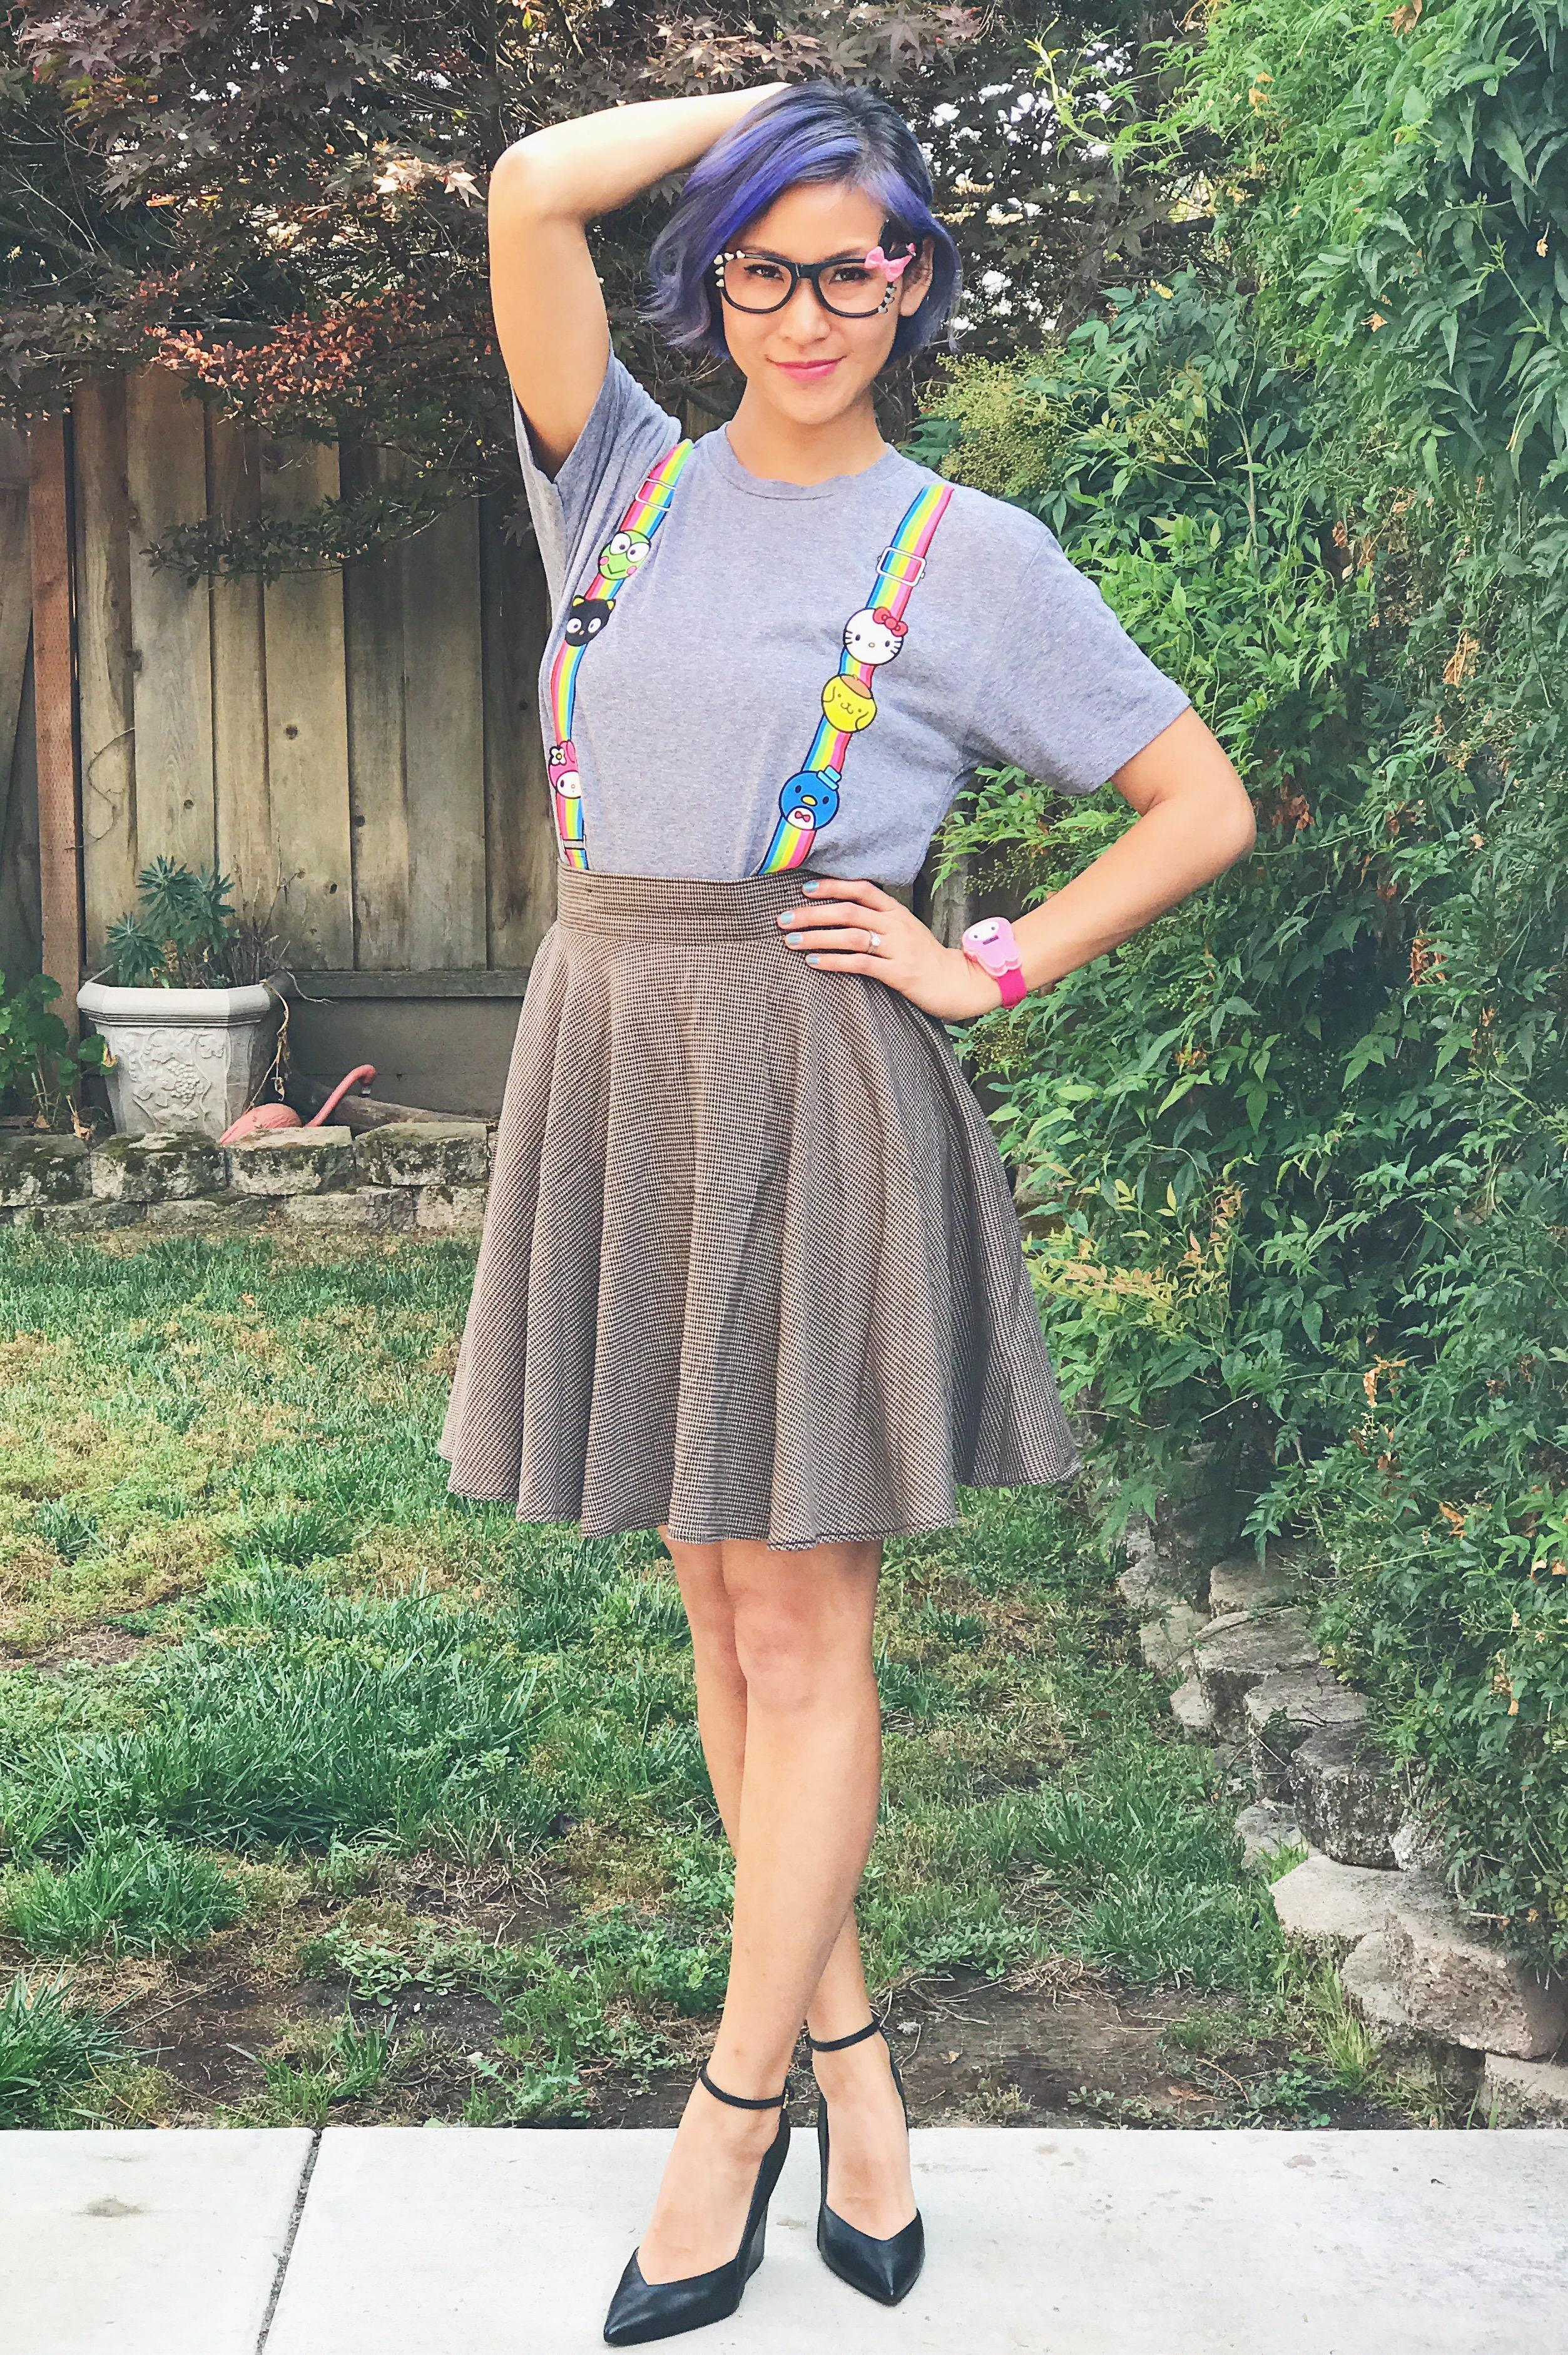 SDCC Sanrio Suspenders Rainbow Tee Geeky Outfit